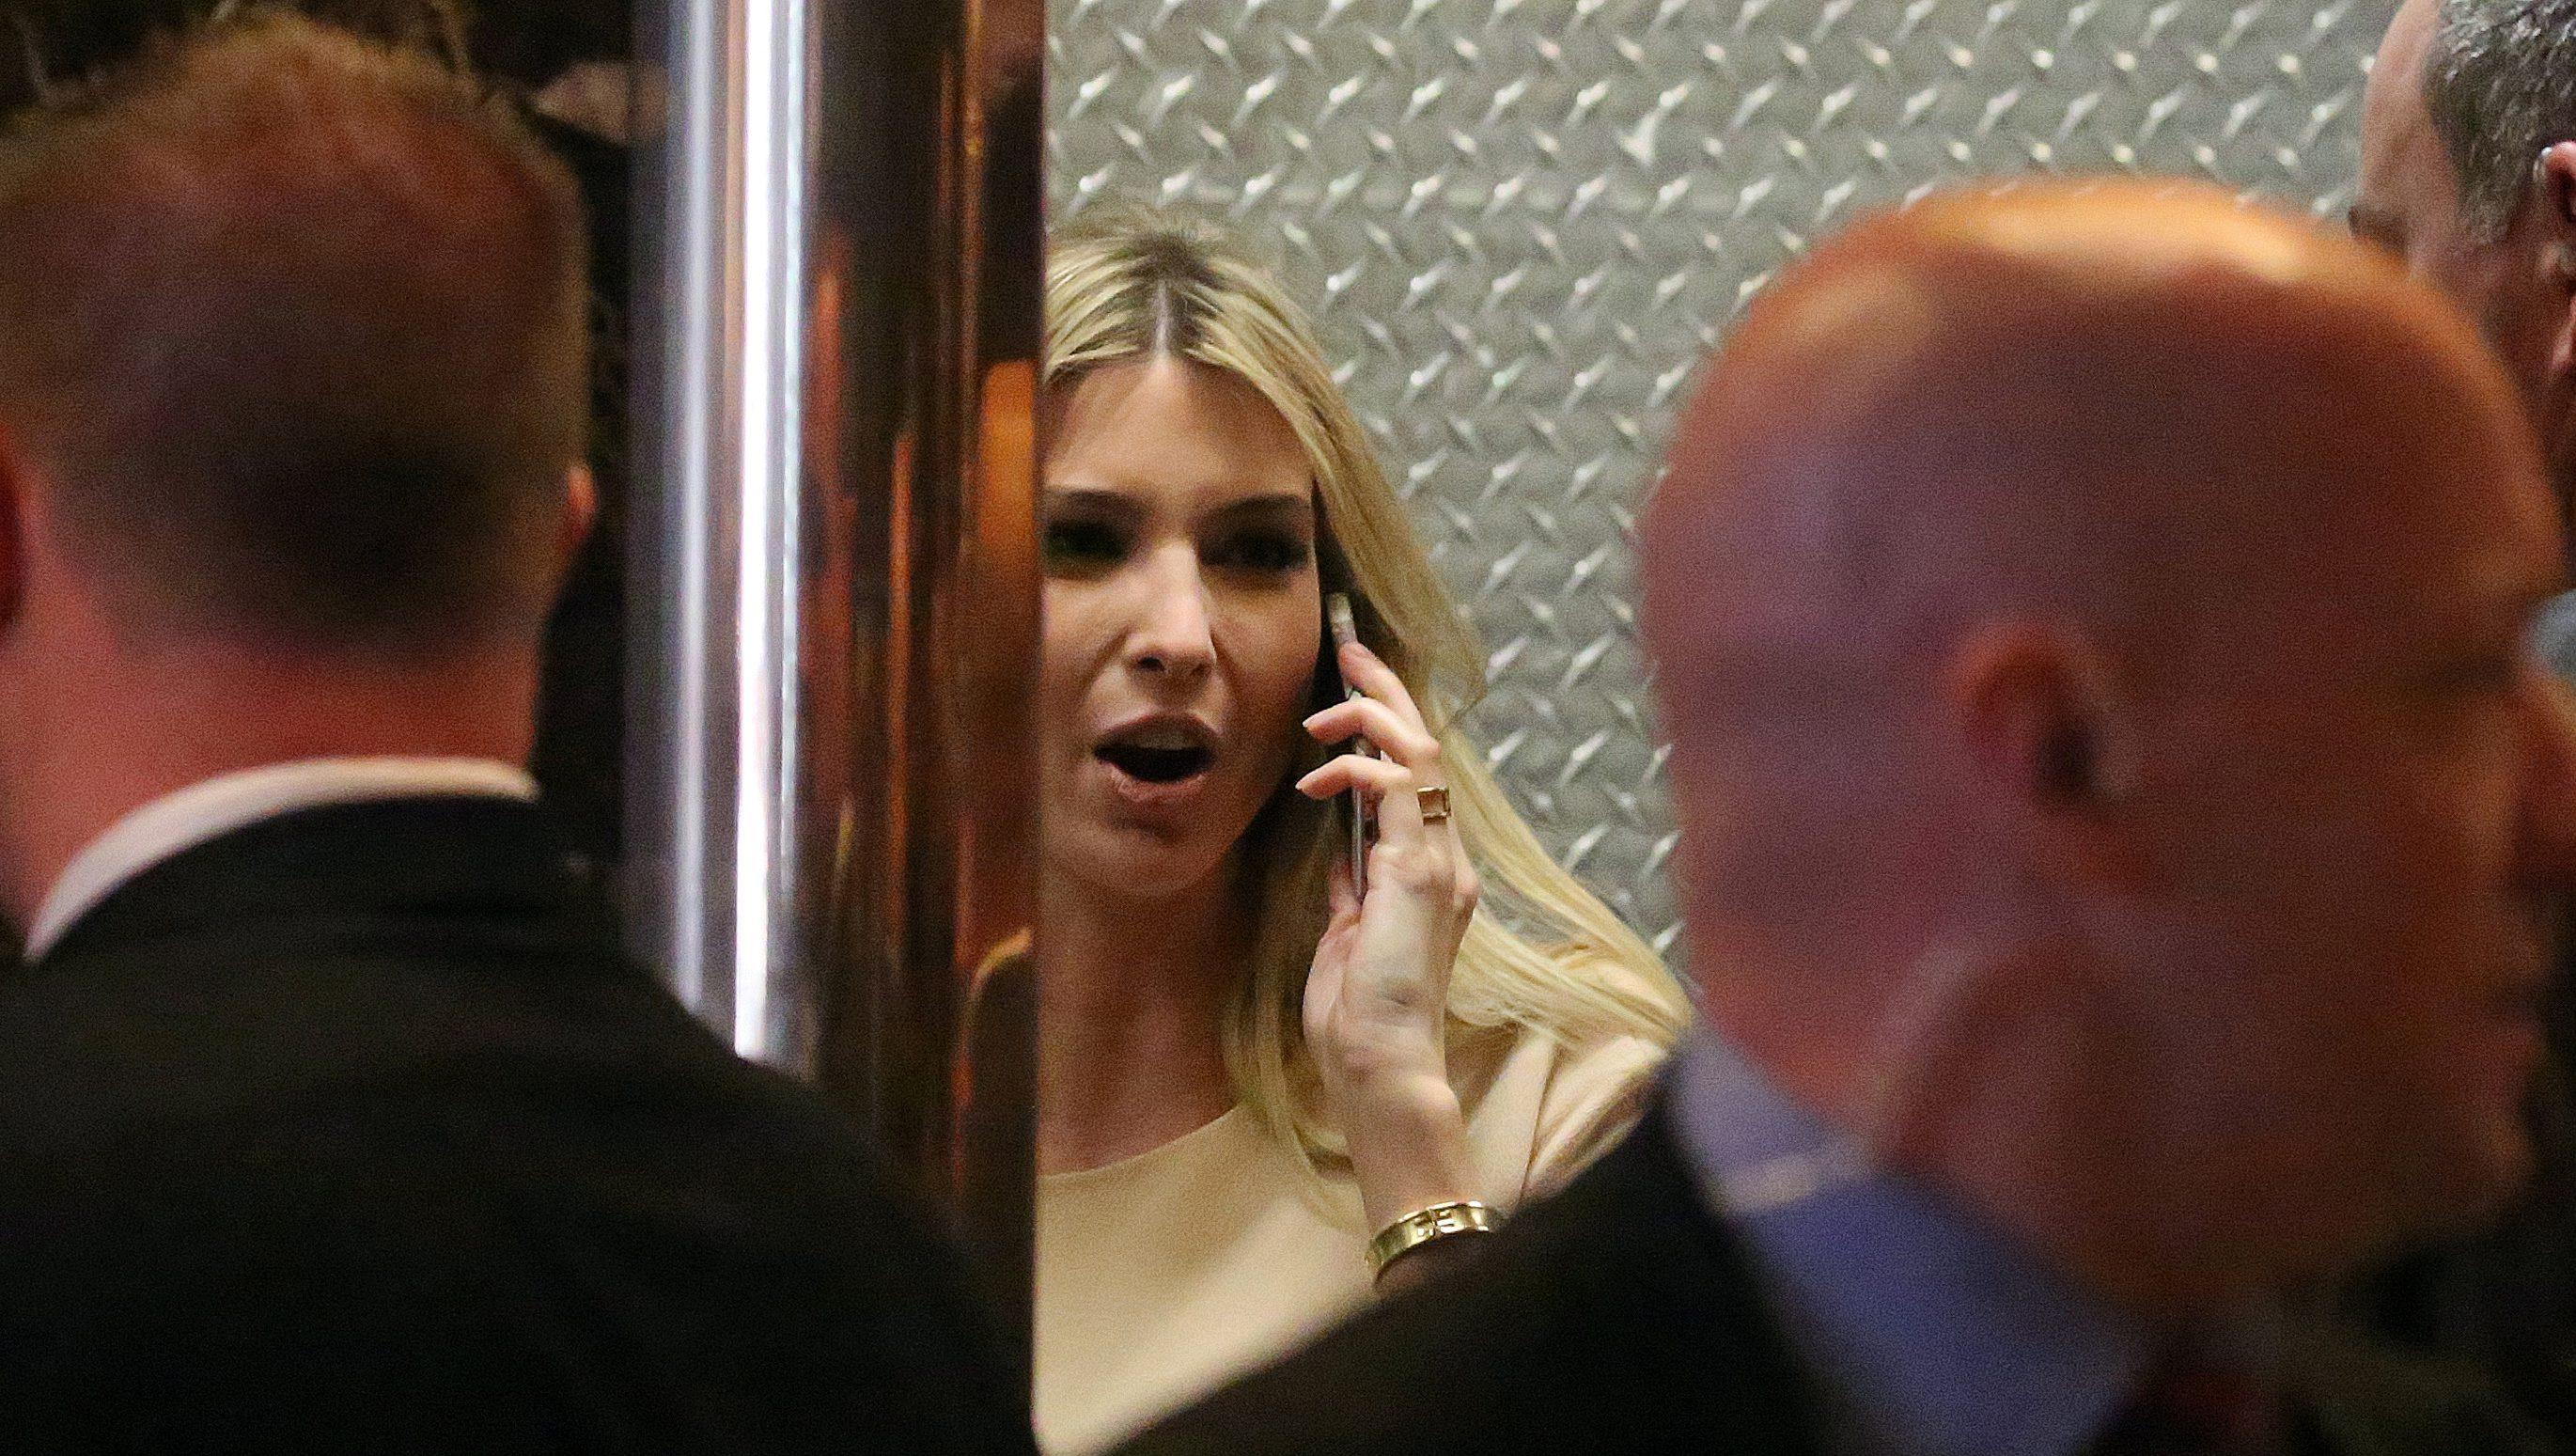 Republican President-elect Donald Trump's daughter Ivanka Trump arrives at Trump Tower in New York, New York, U.S., November 11, 2016. REUTERS/Carlo Allegri - RTX2T985